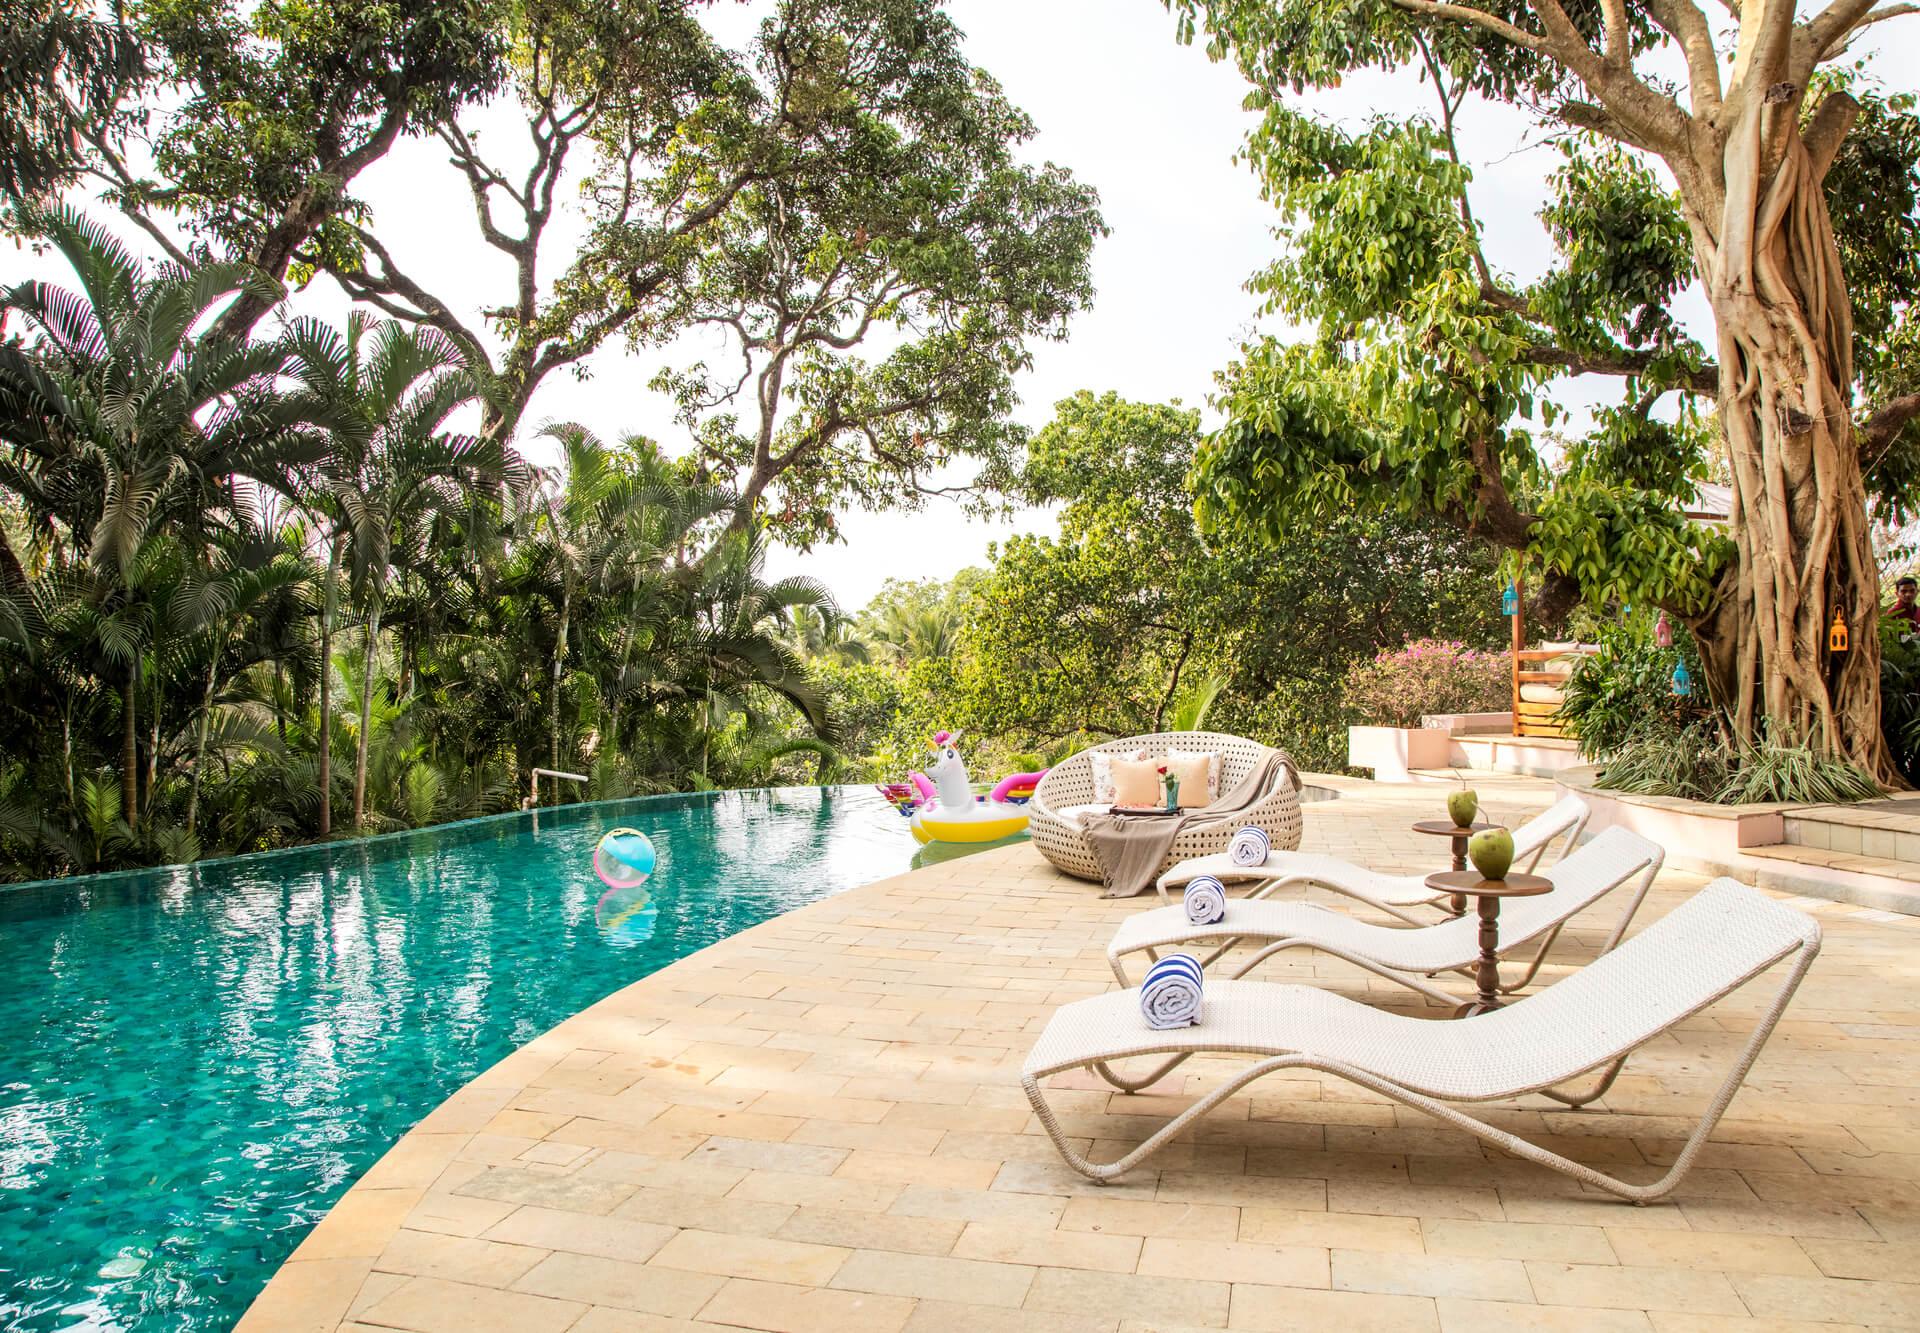 Rainbowtree - Private pool villas in Goa